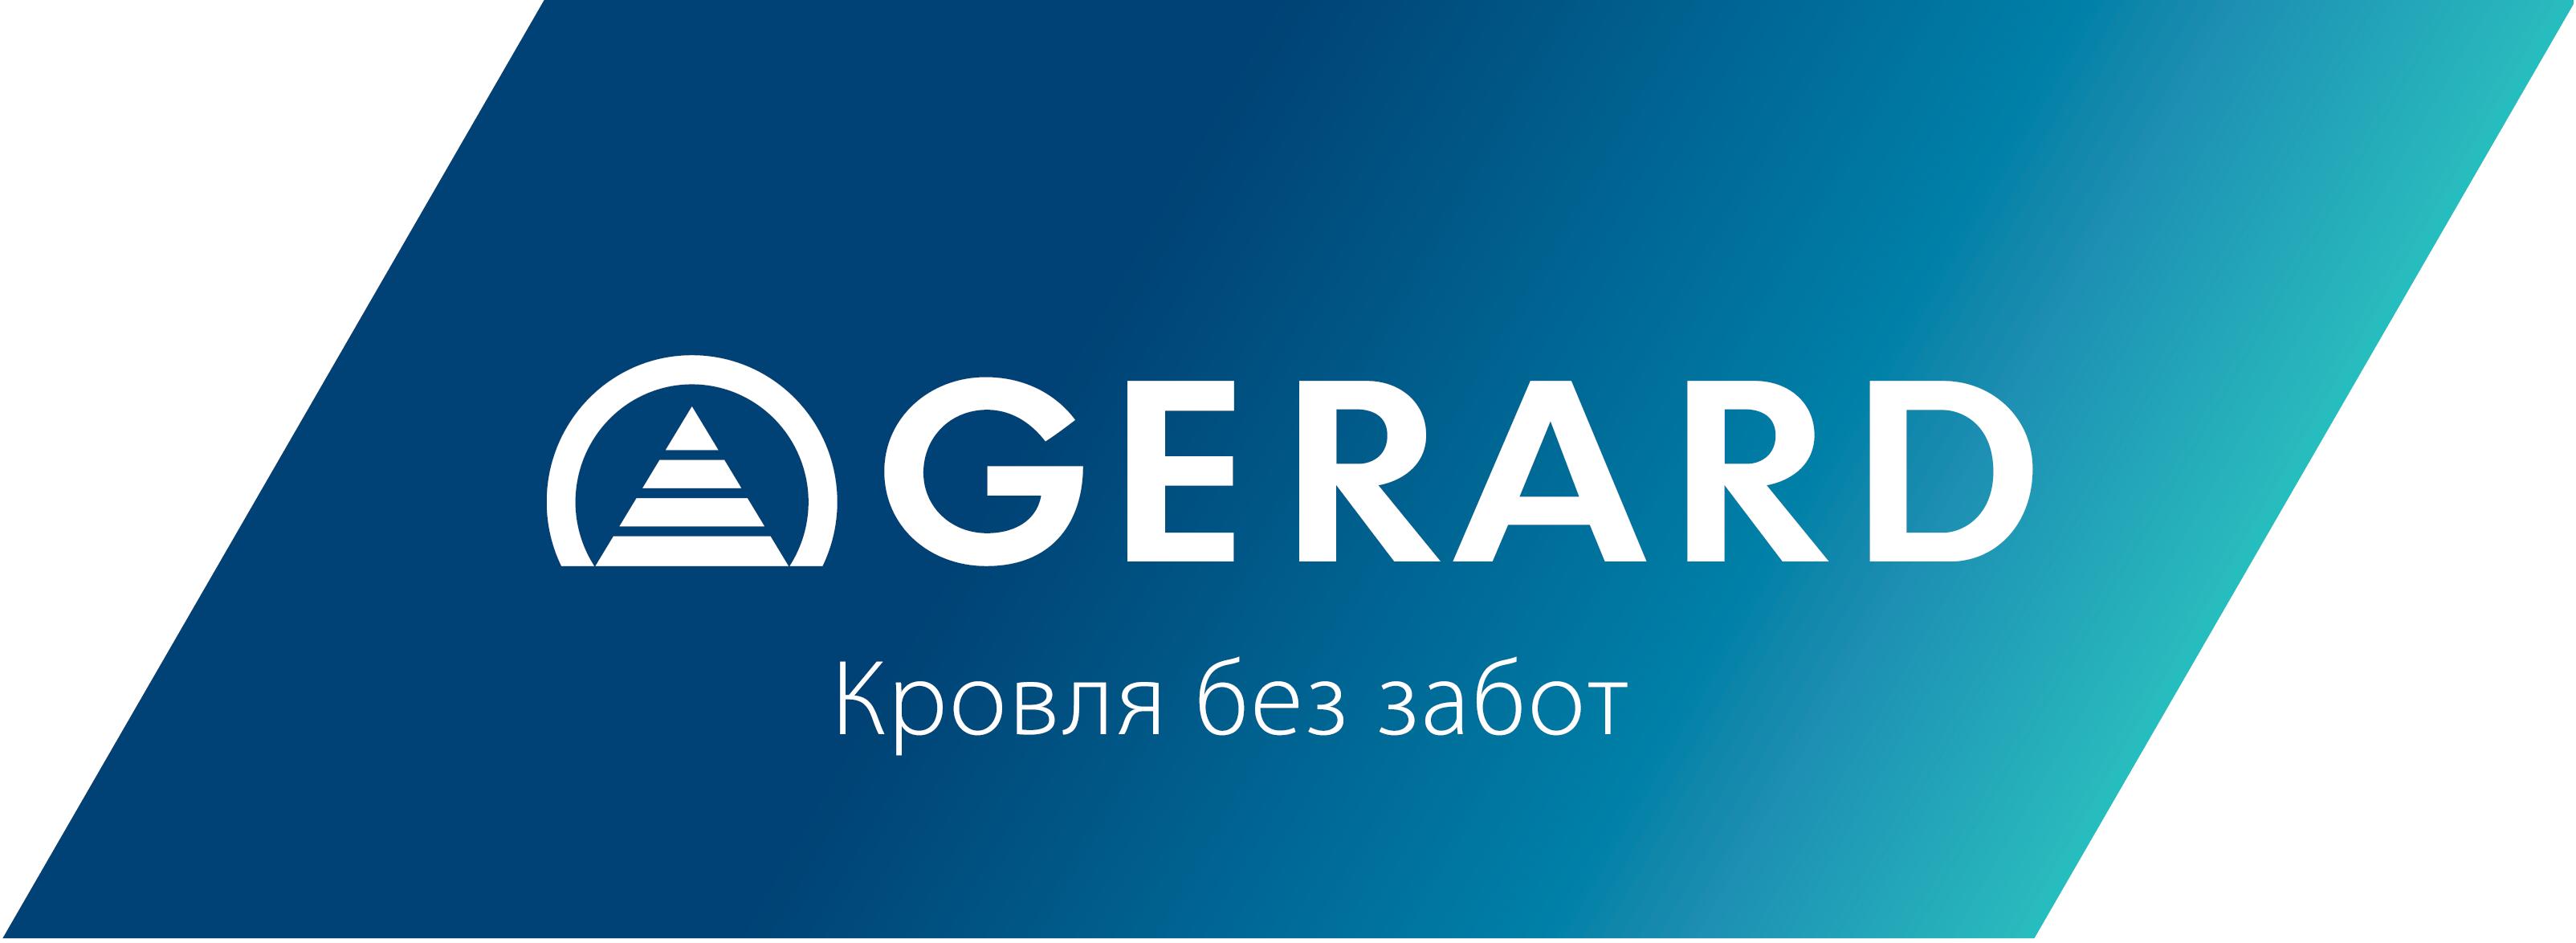 GERARD- Акция